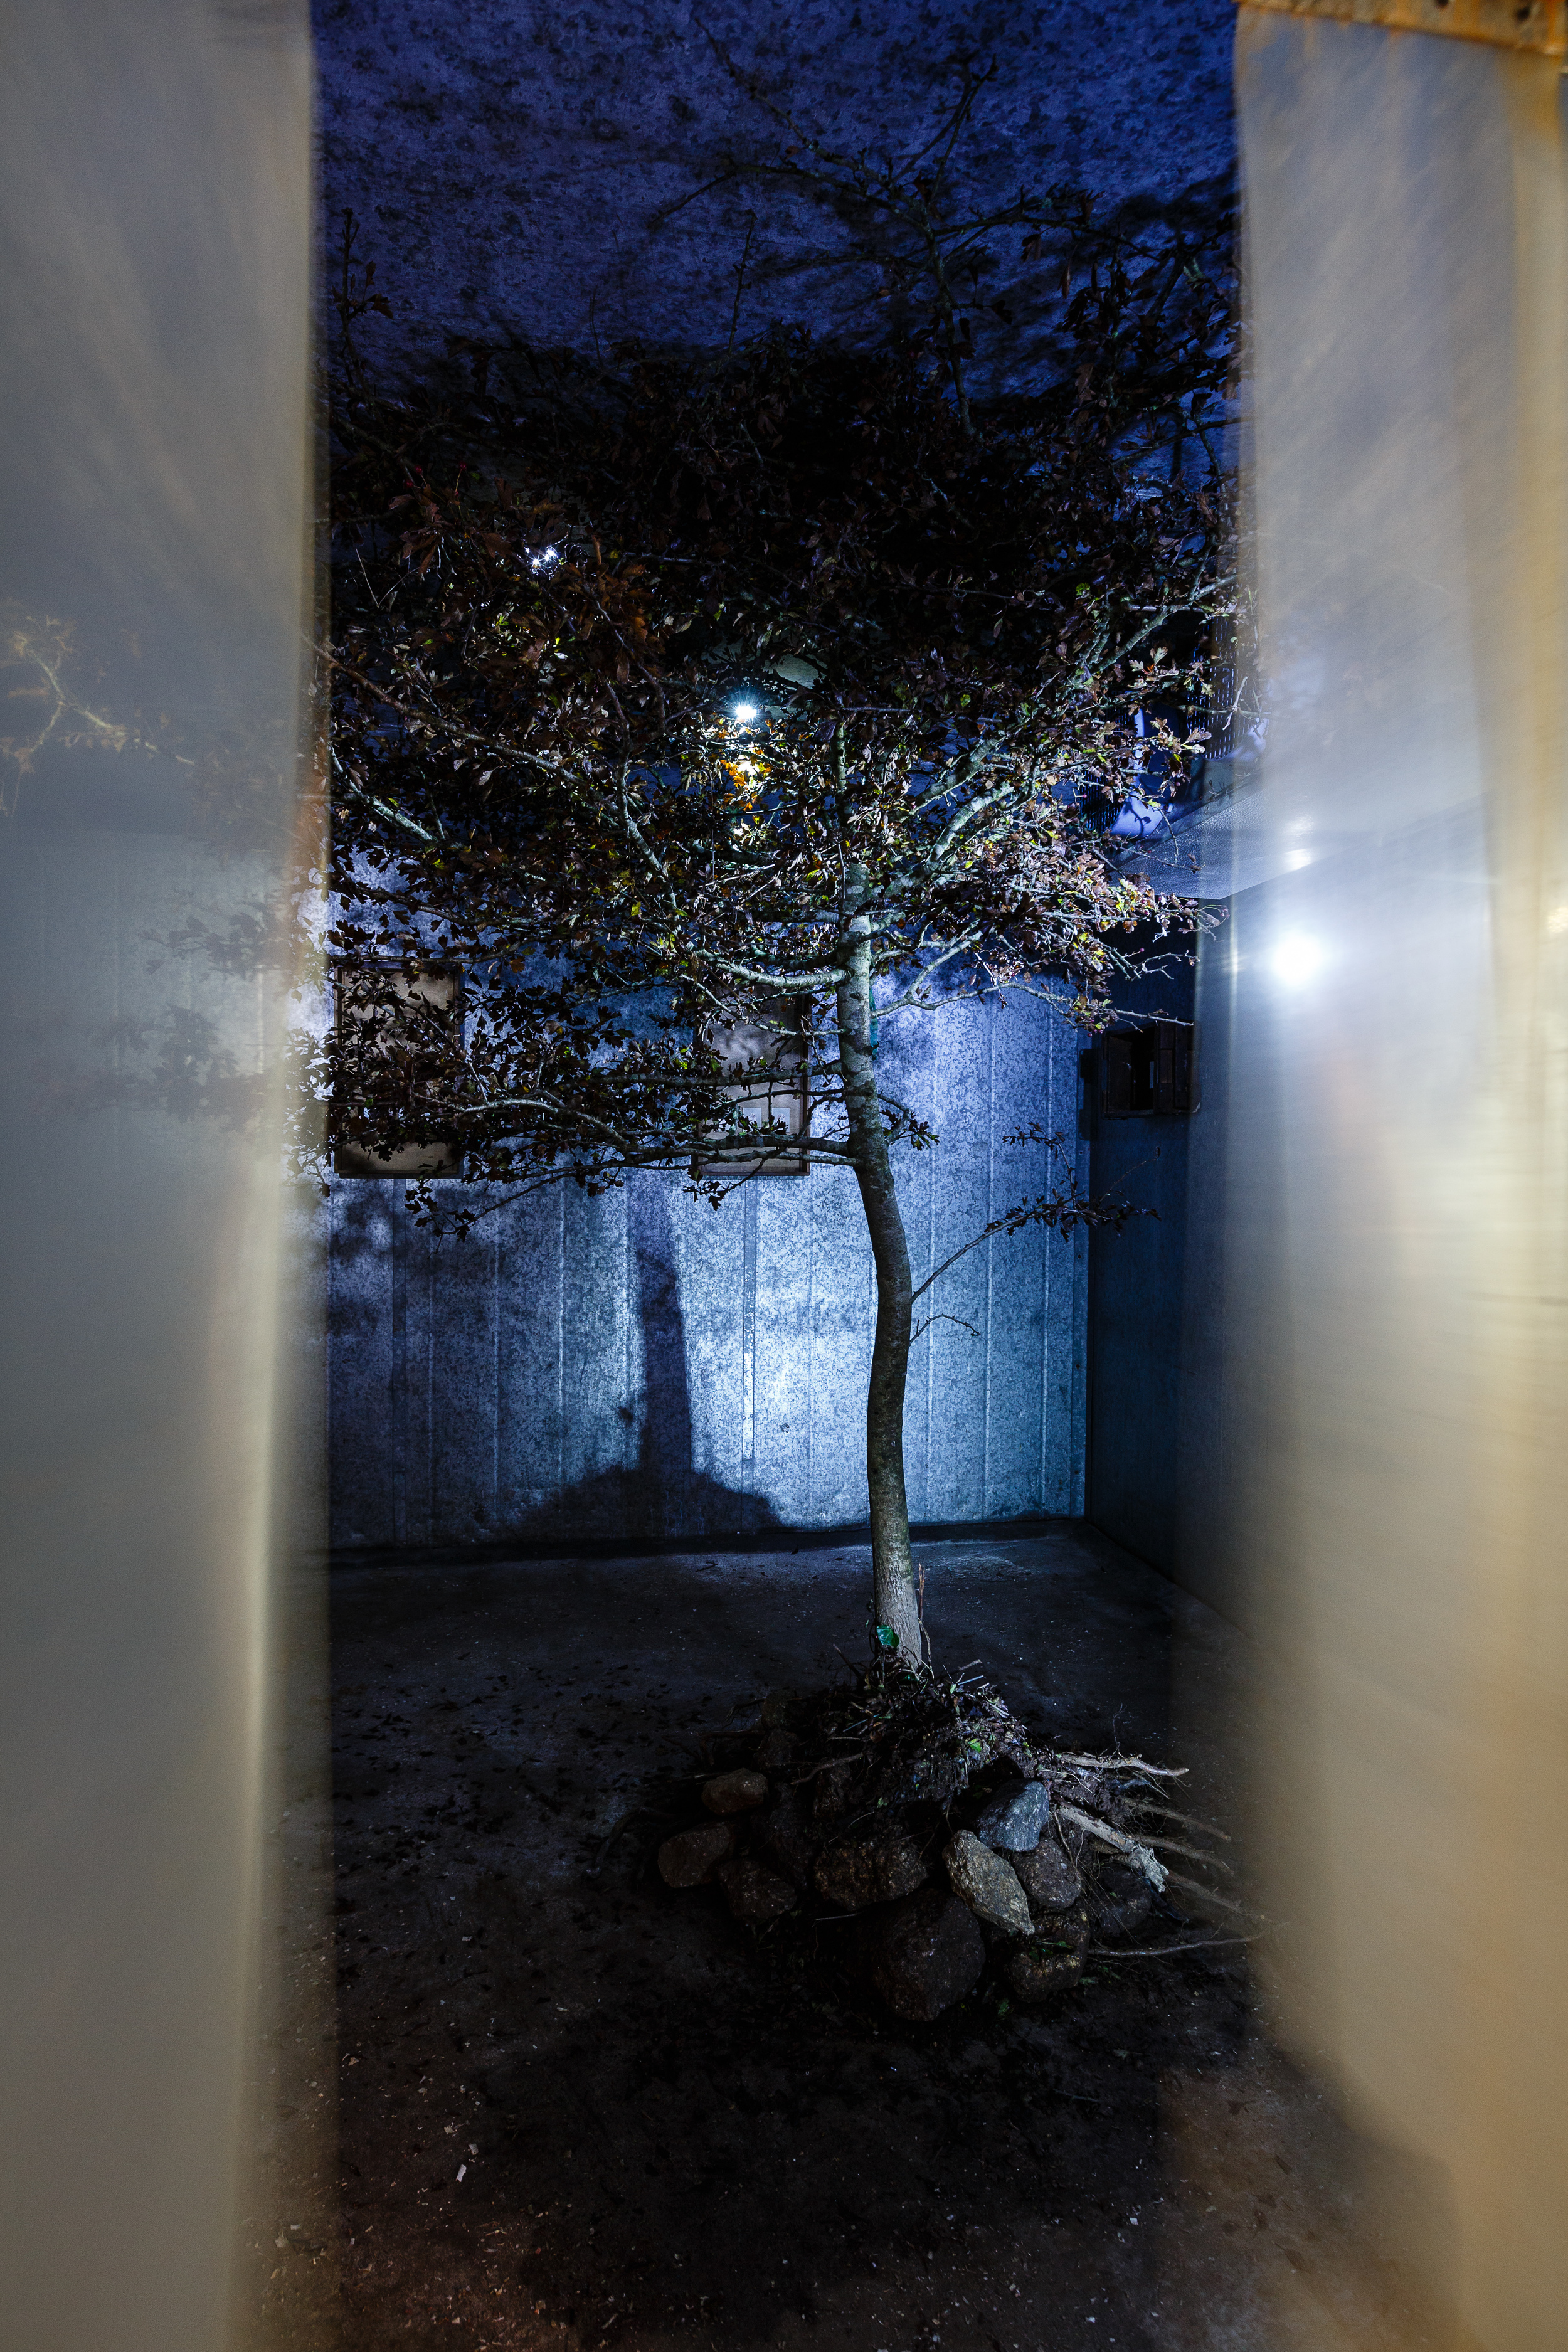 Nature boys sanctum. Inspiration from the poem Encapsulate by Simon Armitage.